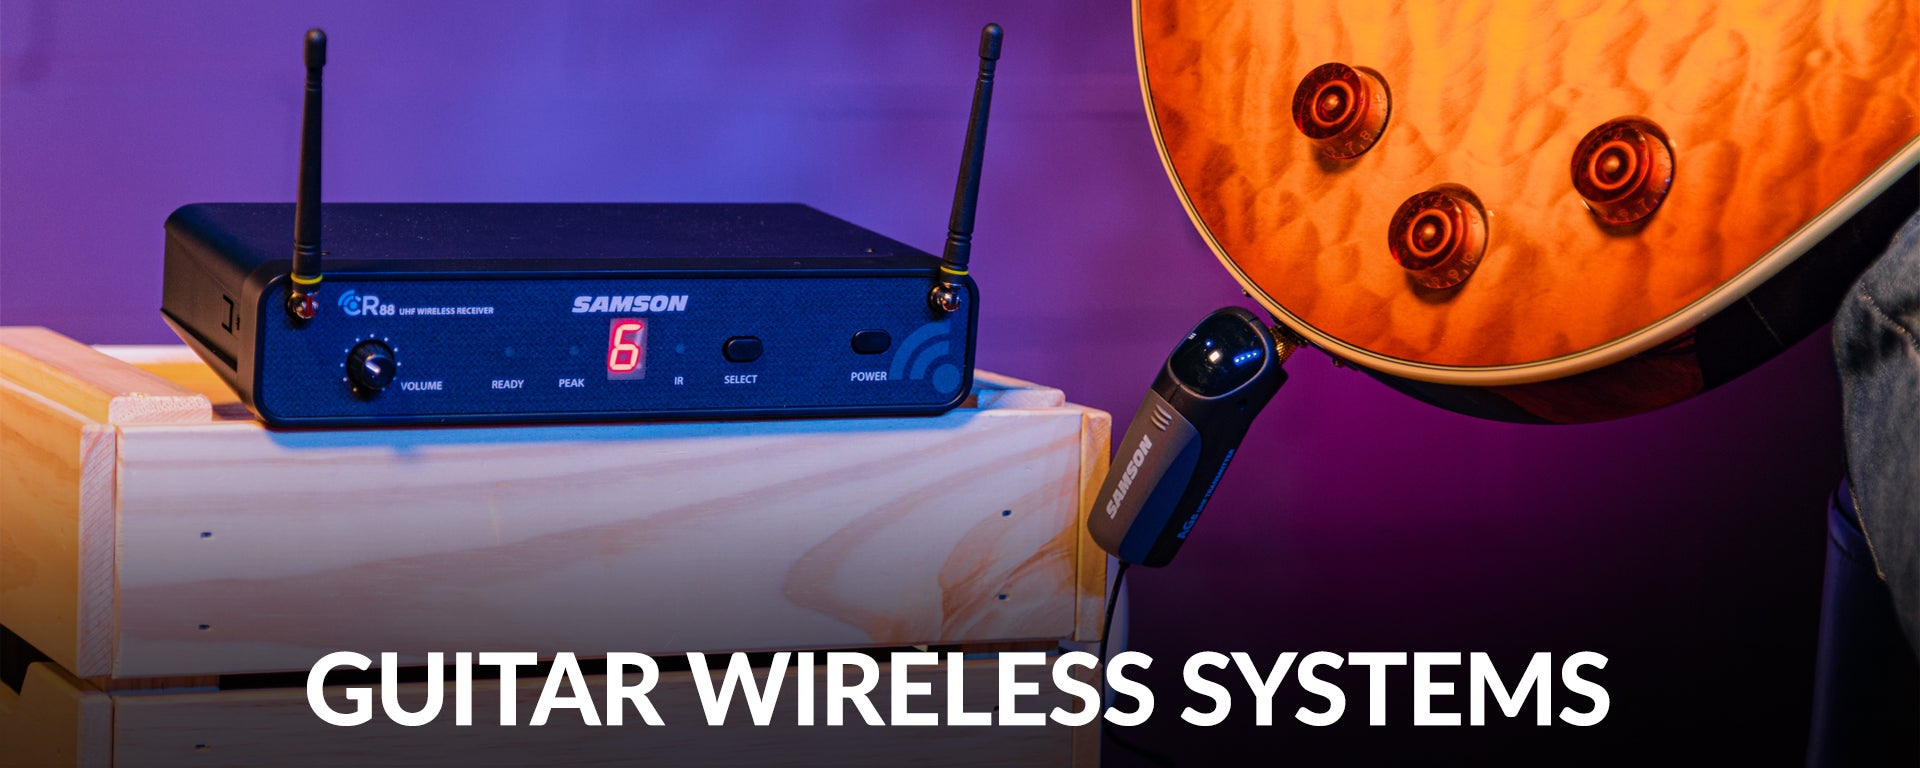 Guitar Wireless Systems at SamAsh.com